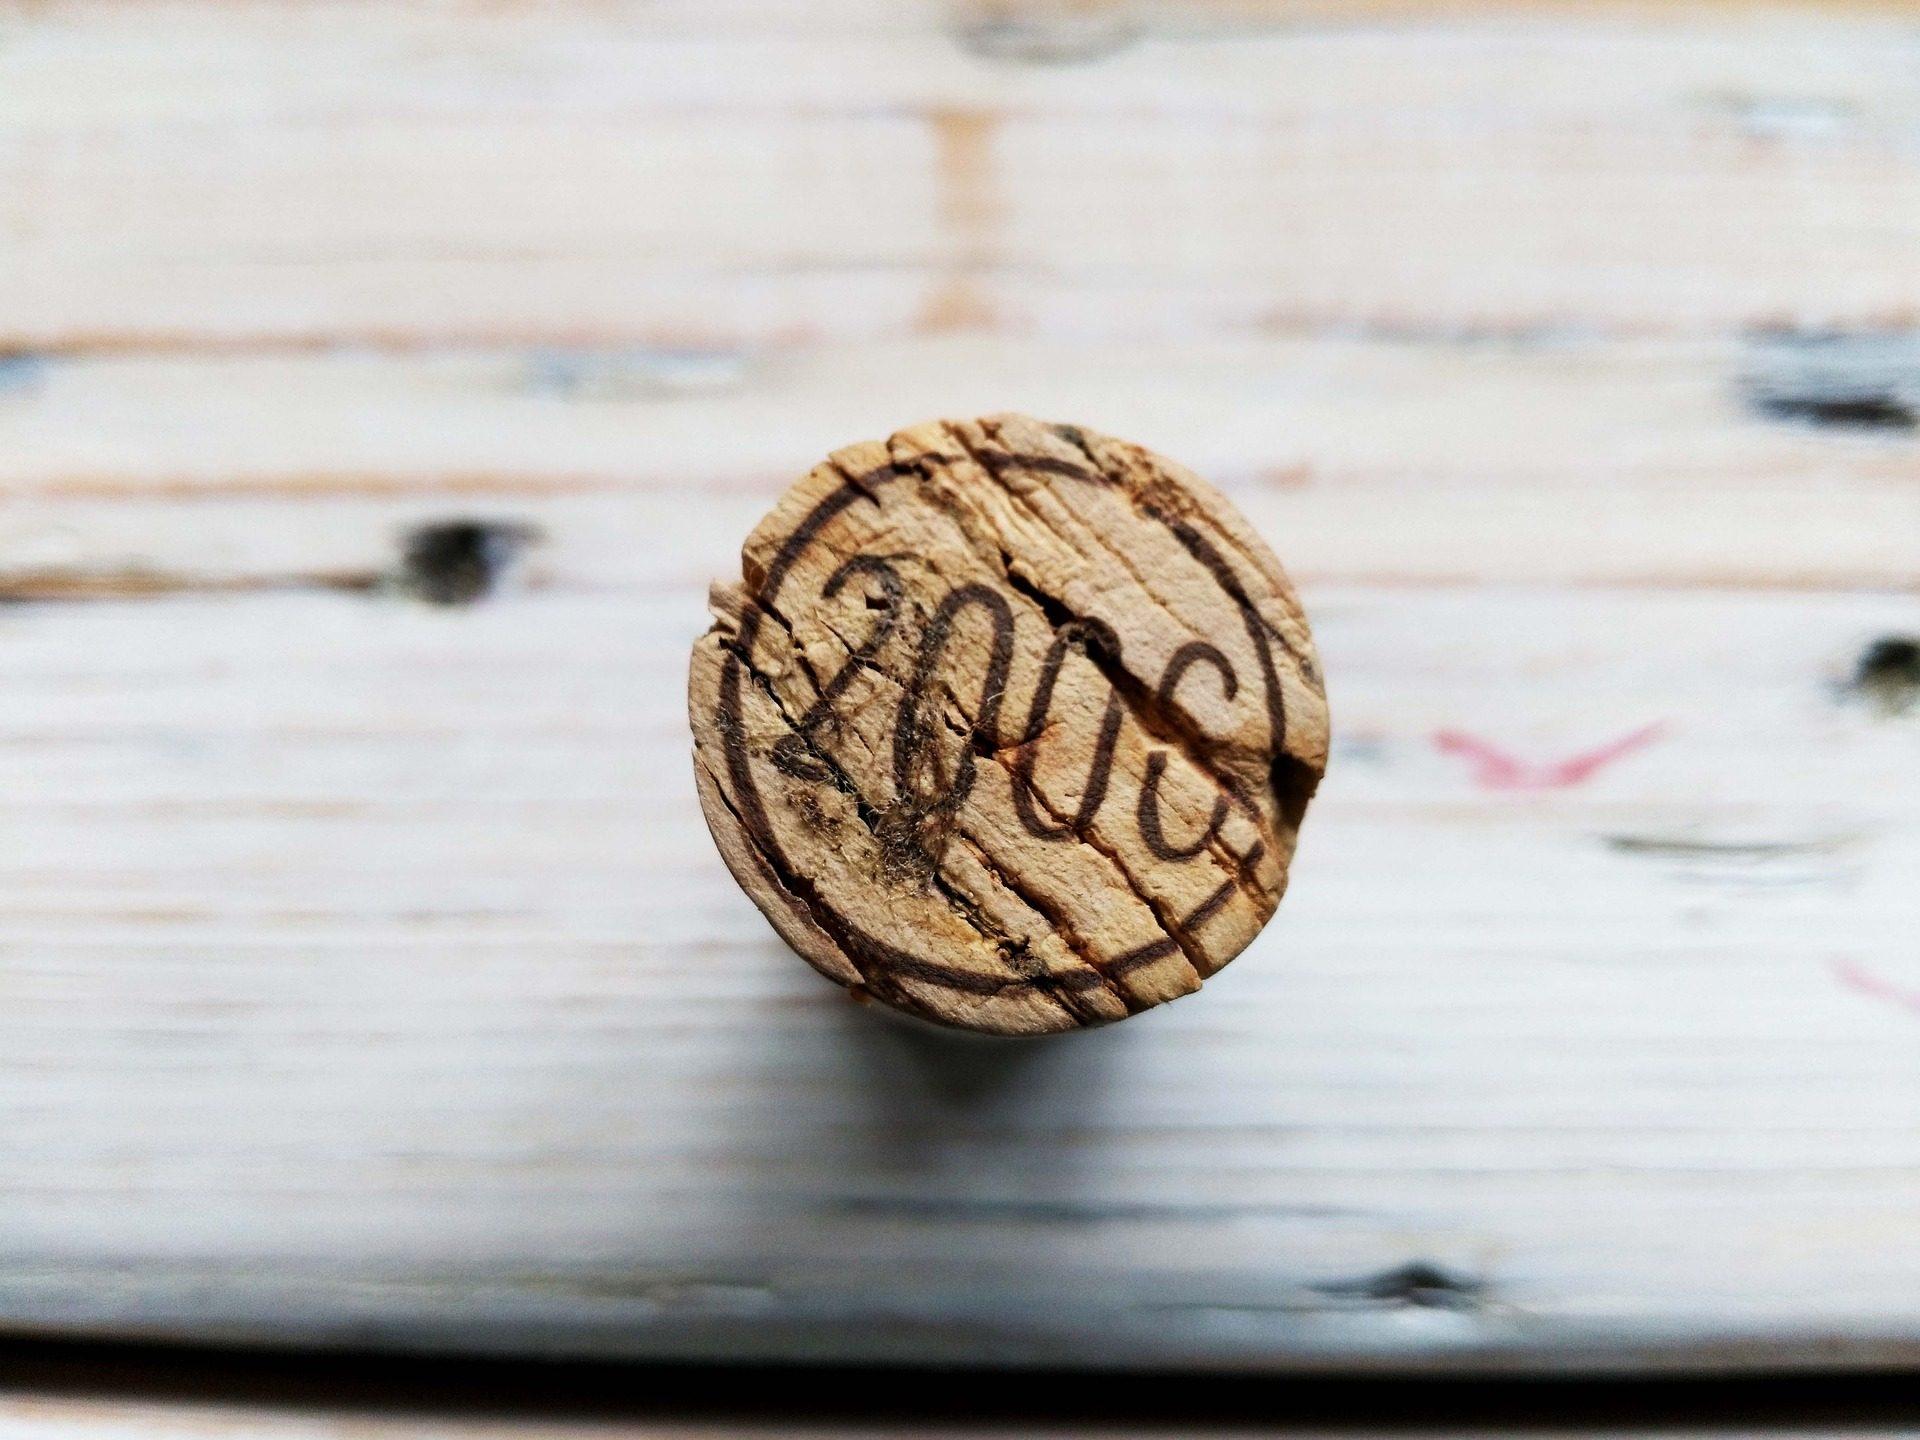 Cork, Tapón, garrafa, vinho, madeira, año - Papéis de parede HD - Professor-falken.com